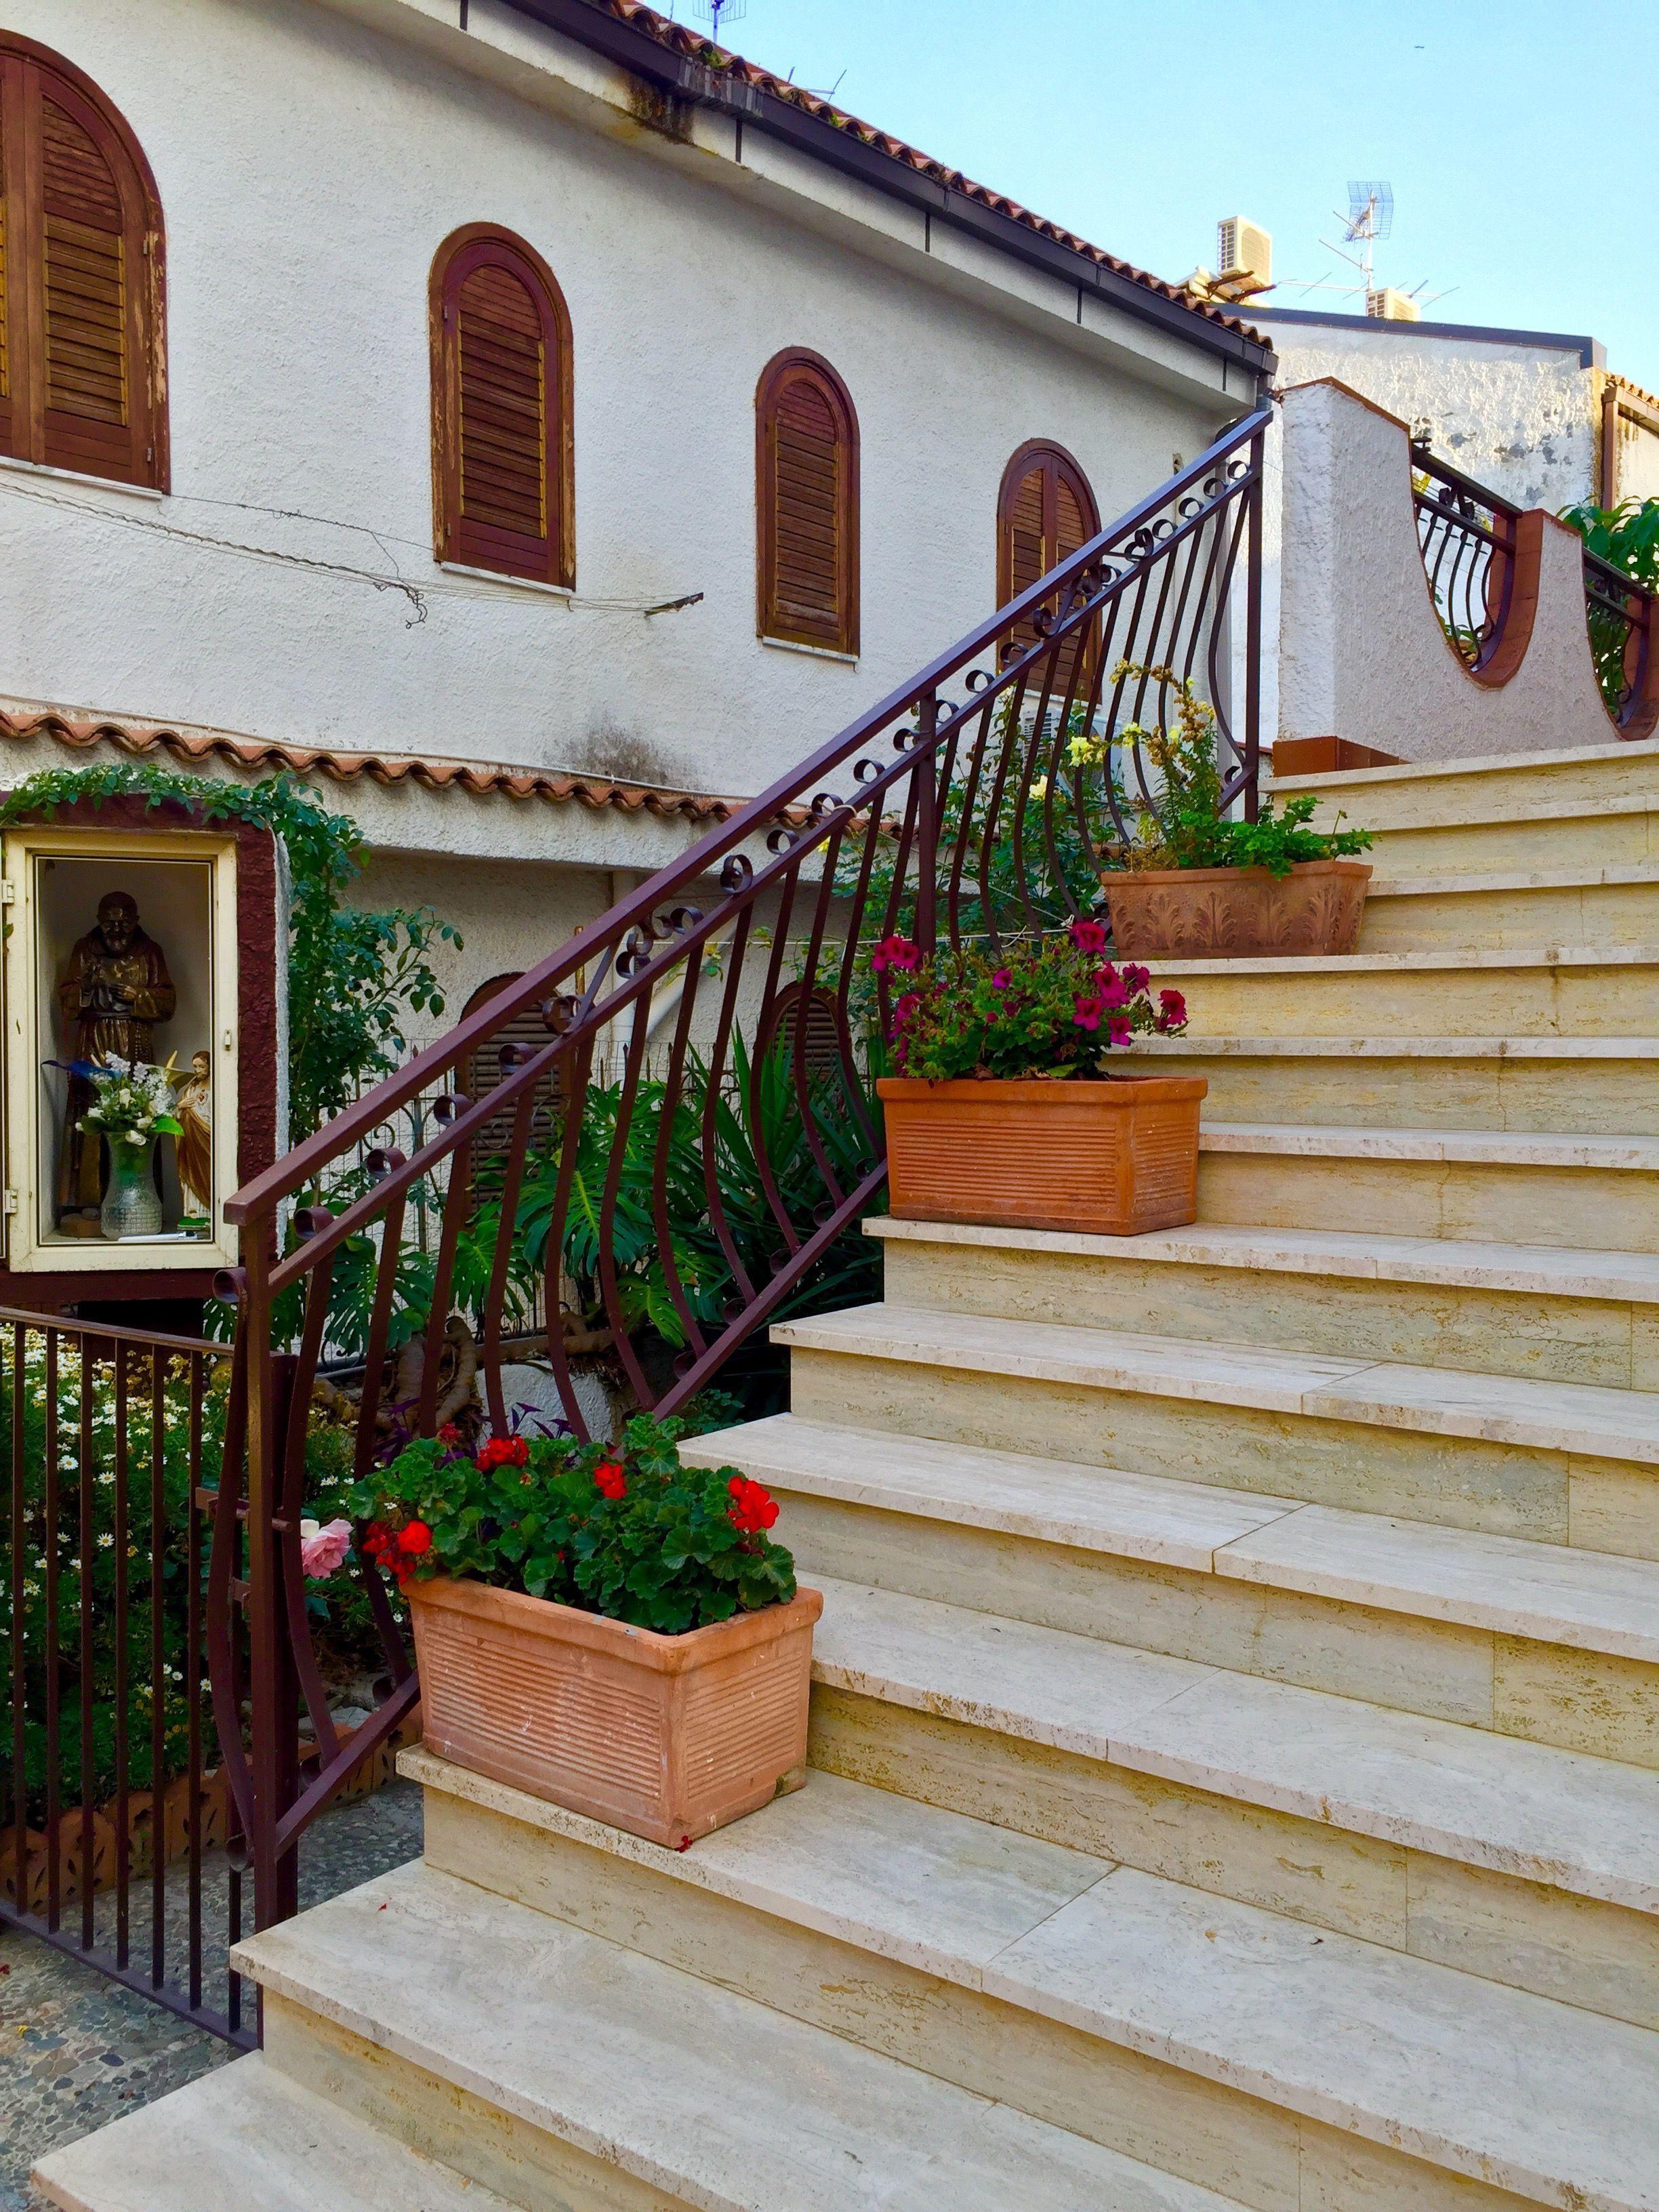 Villa Cavallaro, Giardini Naxos, Sicily, Italy Decor